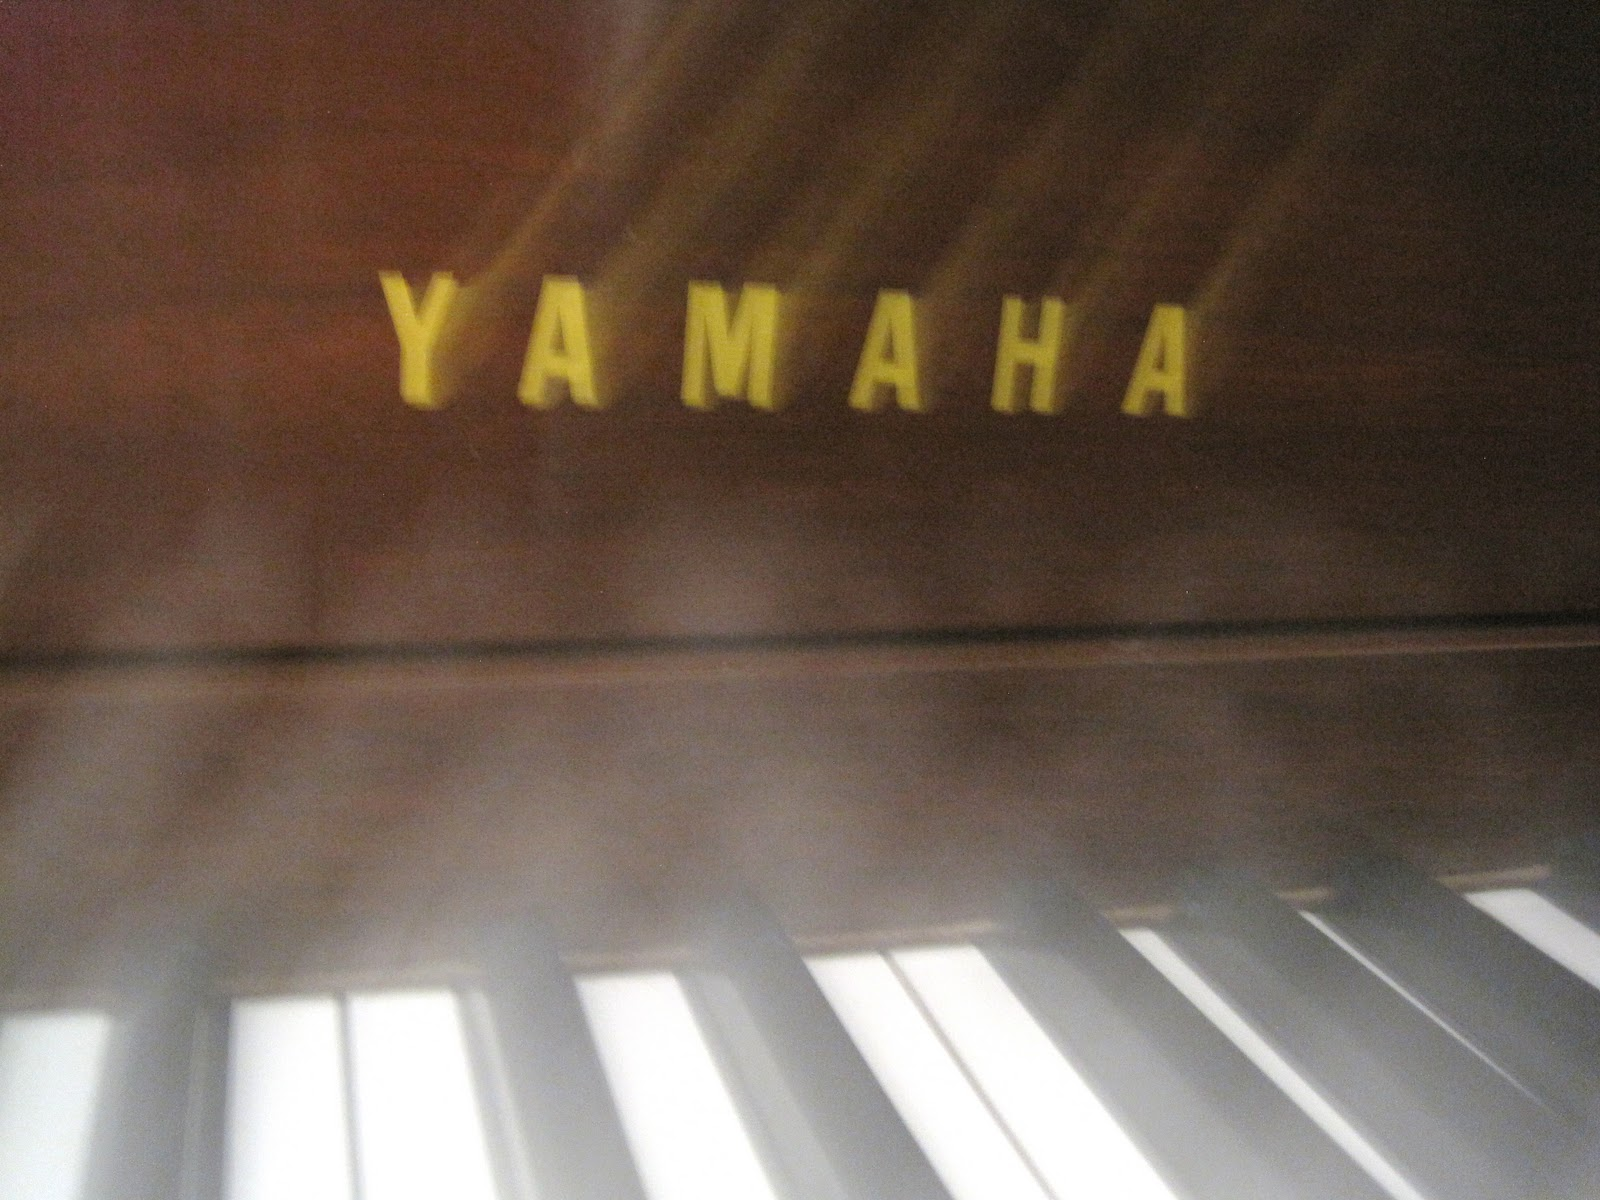 Az piano reviews october 2011 for Yamaha n3 price